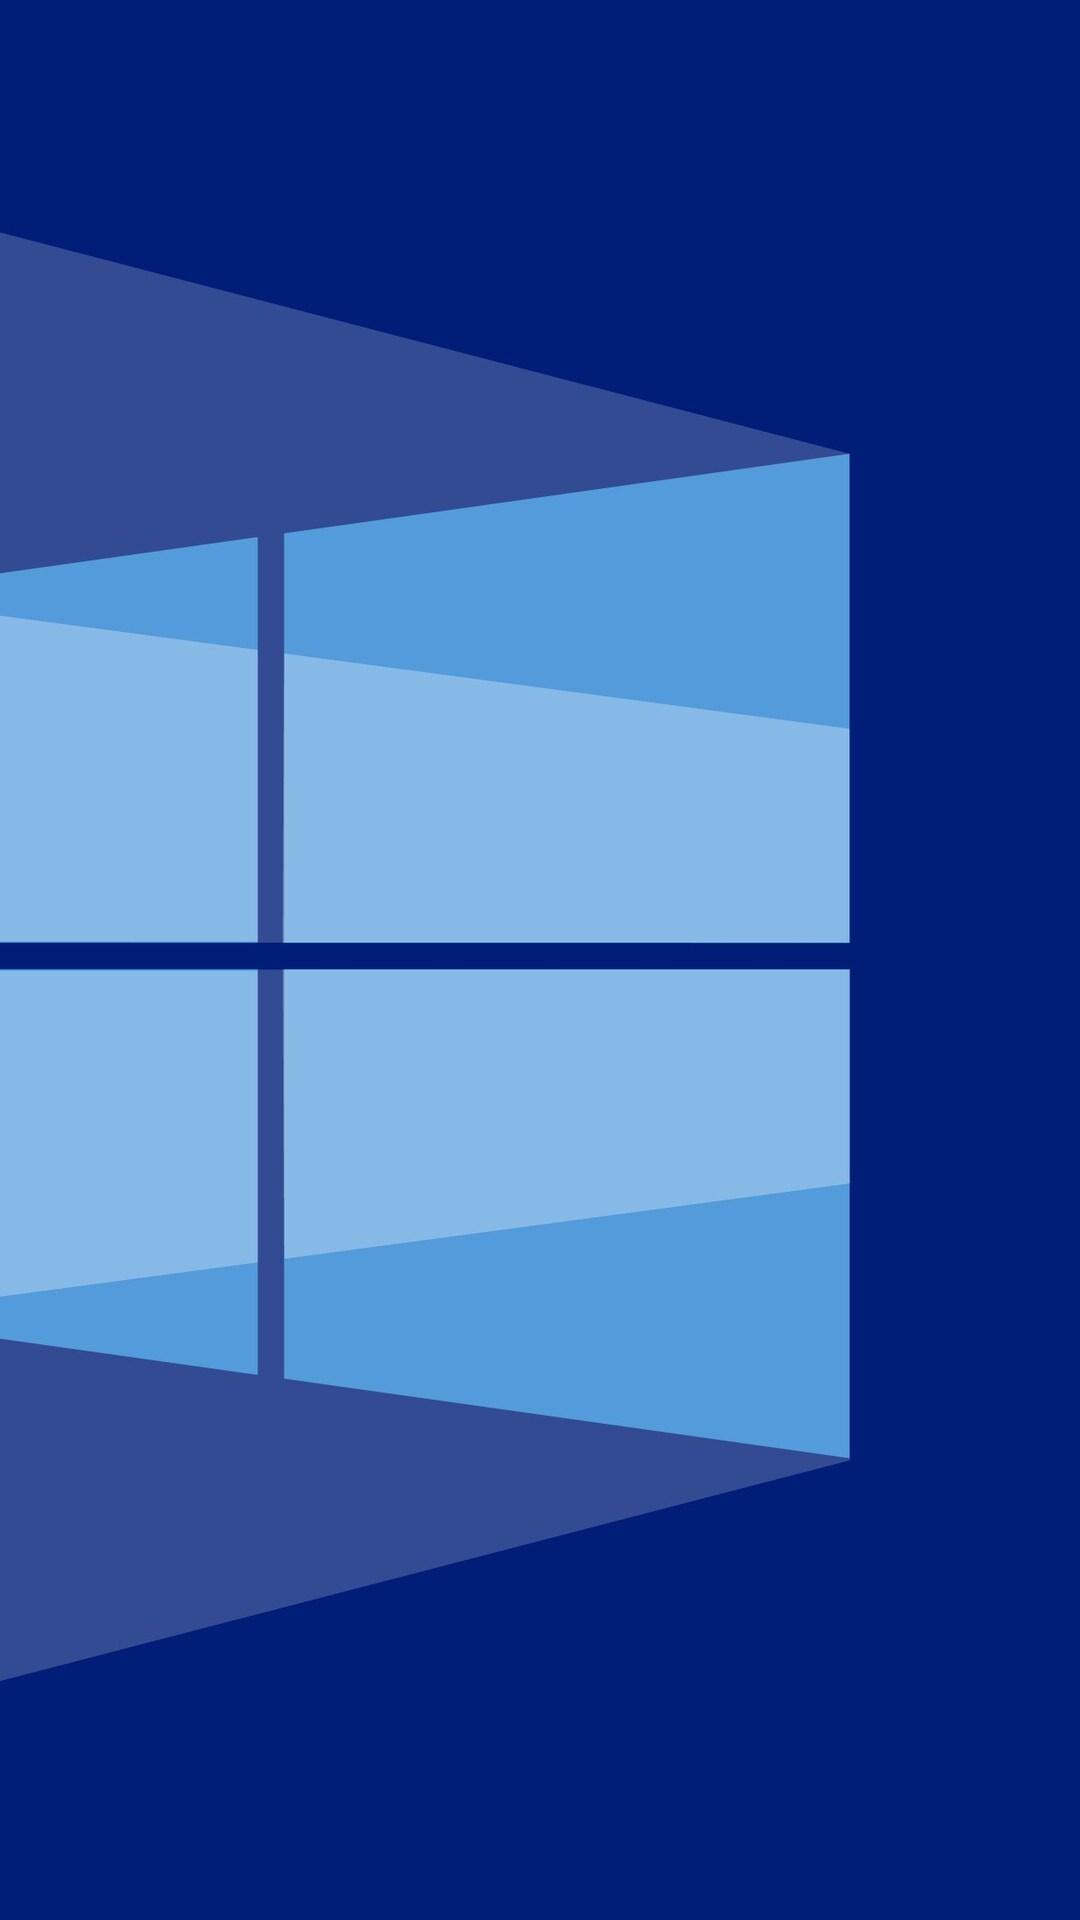 windows-10-original-4k.jpg